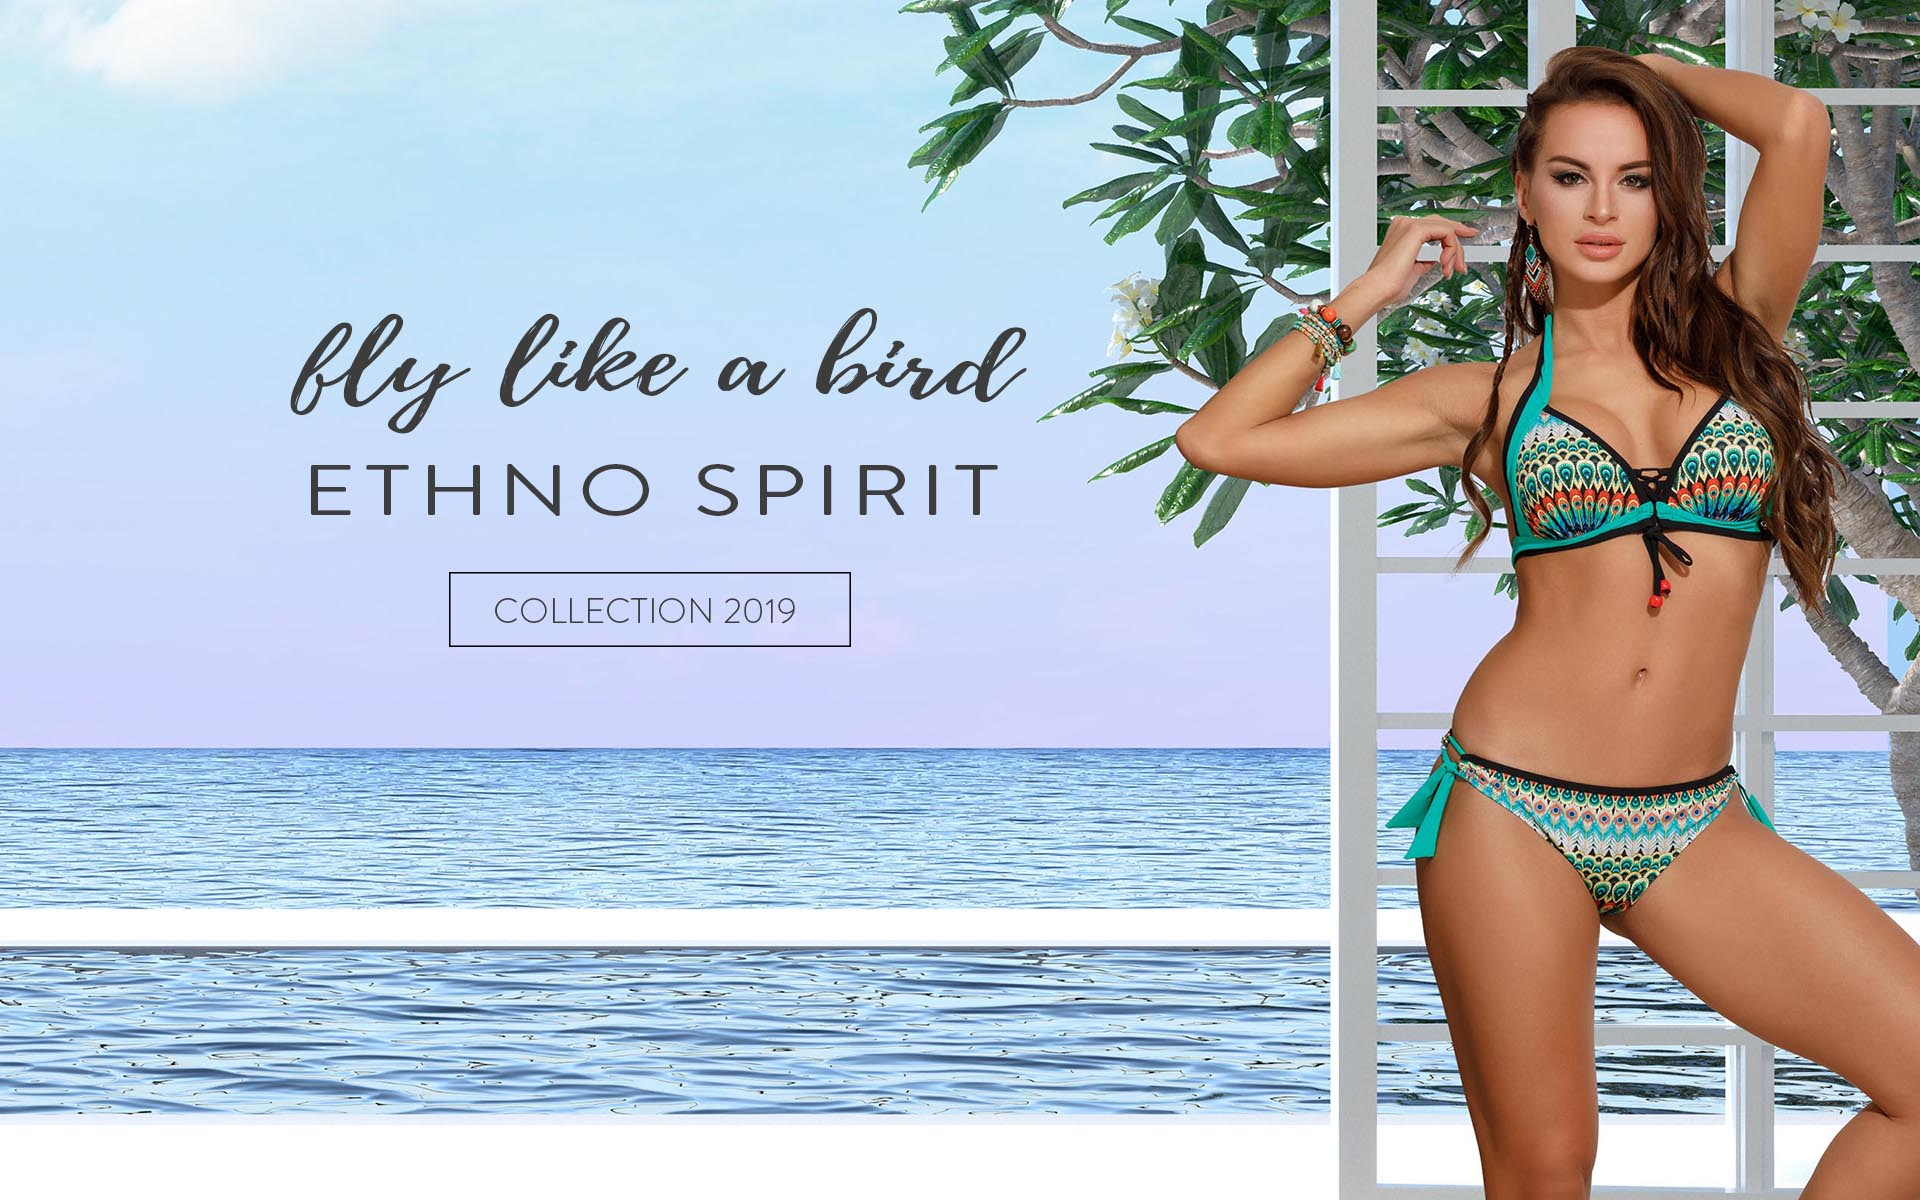 carib-furdoruha-bikini-2019-kollekcio-web-5n